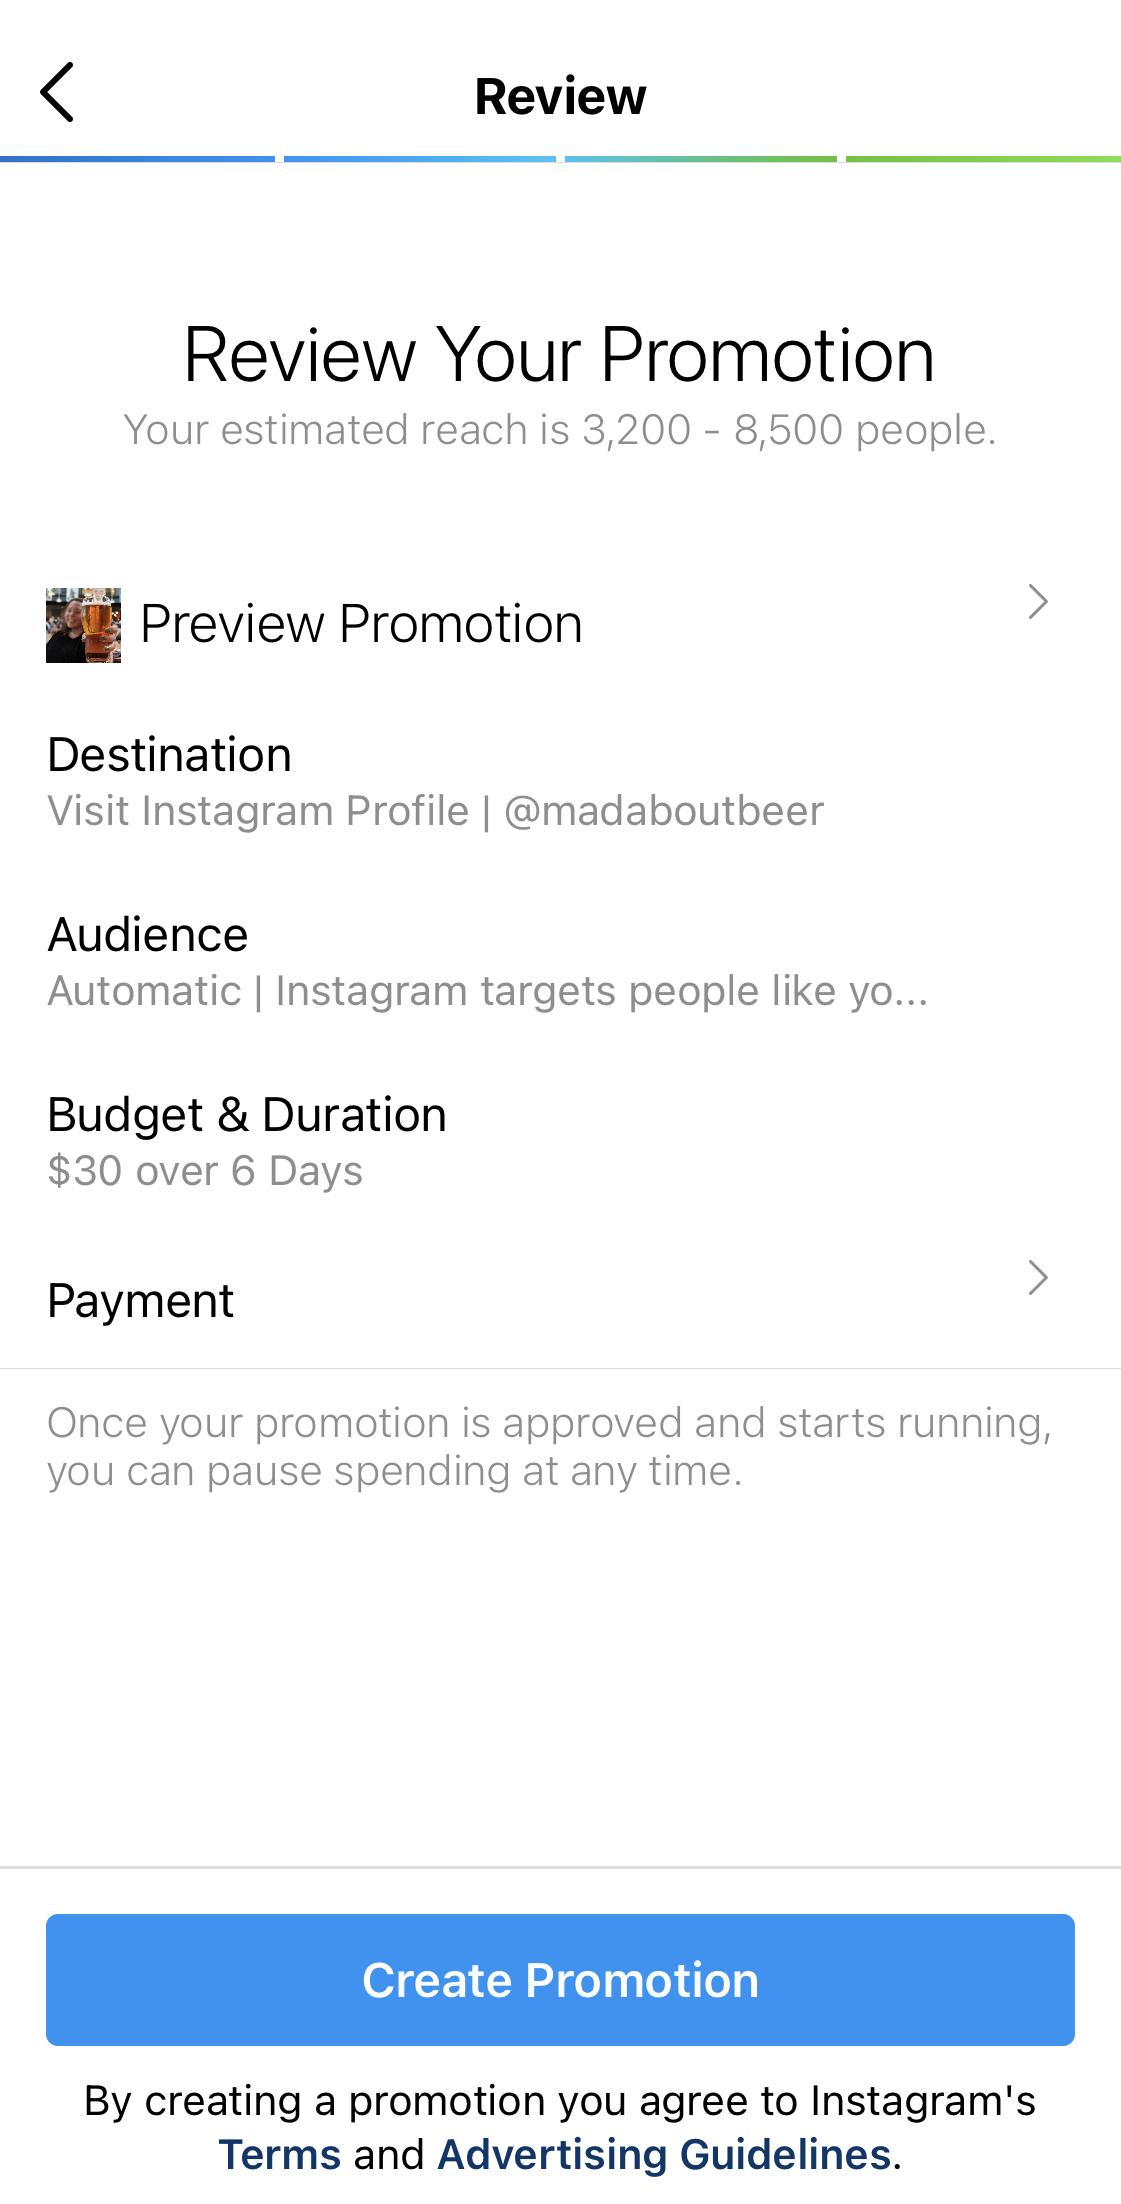 cta button guide image 6 instagram prom